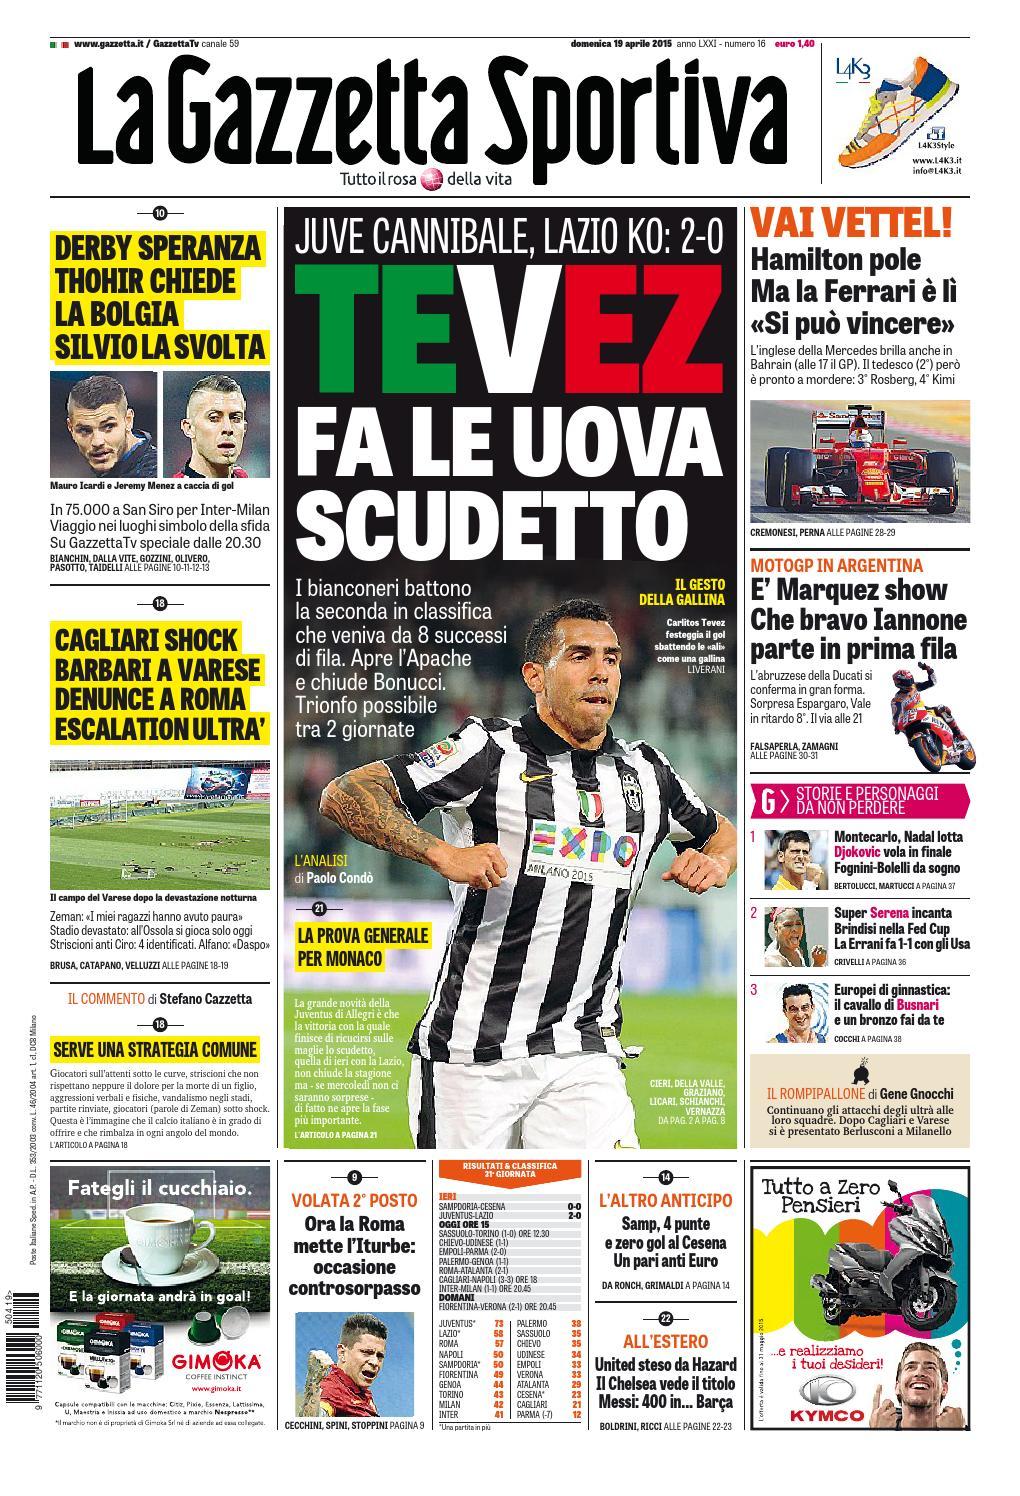 La Gazzetta dello Sport (04-19-20150 by Nguyen Duc Thinh - issuu 4a28535d39b